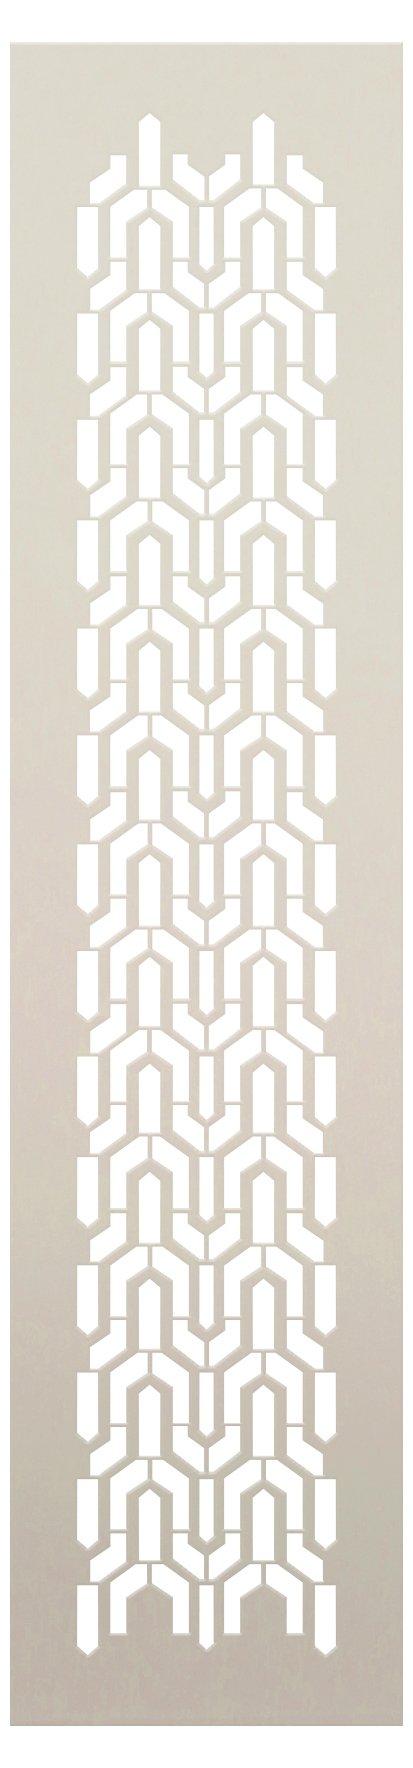 Arabian Steeple Mosaic Band Stencil by StudioR12 | Craft DIY Backsplash Pattern Home Decor | Reusable Mylar Template | Paint Wood Sign | Select Size